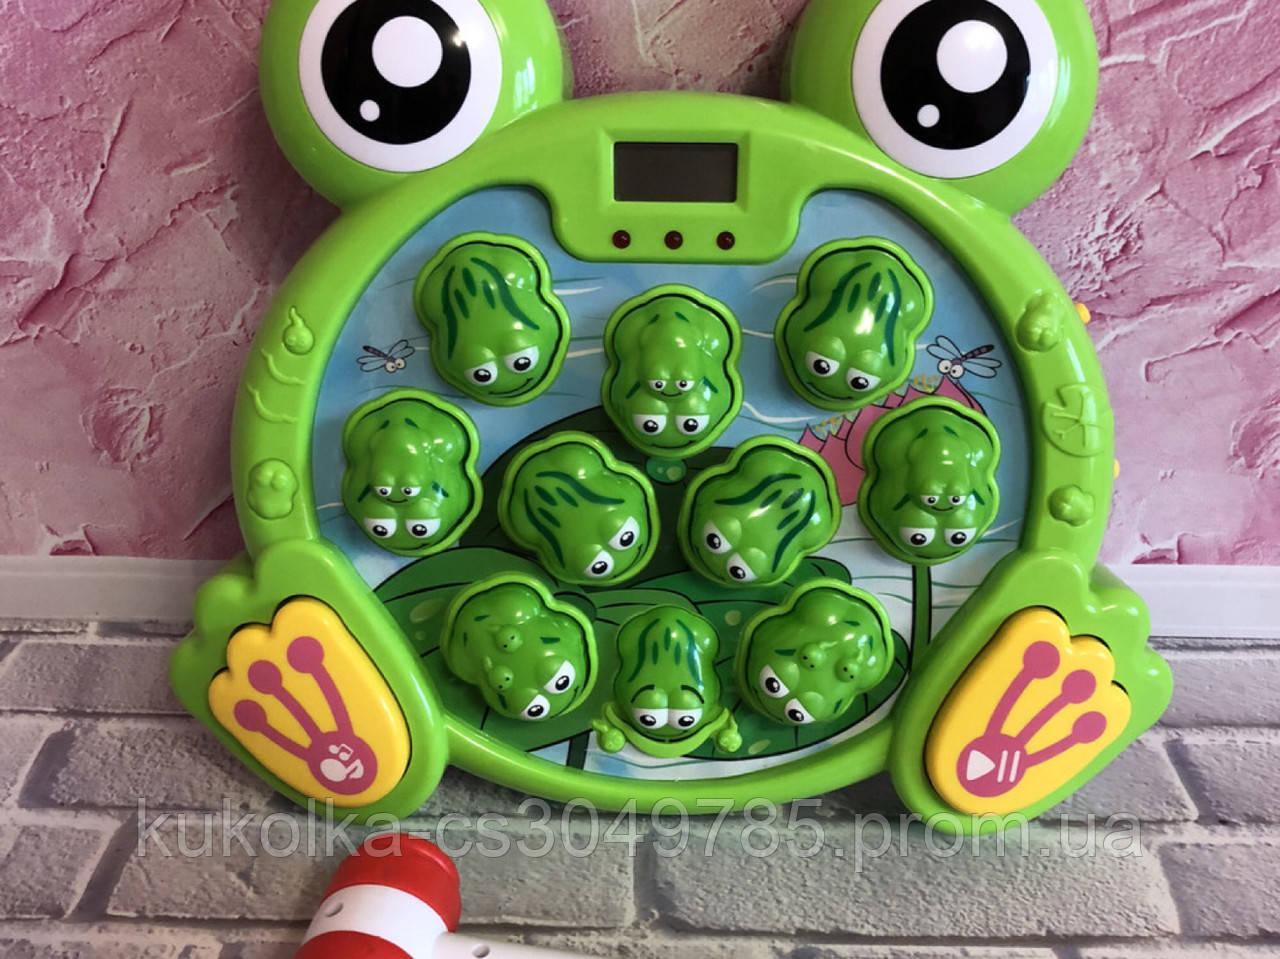 Развивающая игра « Поймай лягушку »